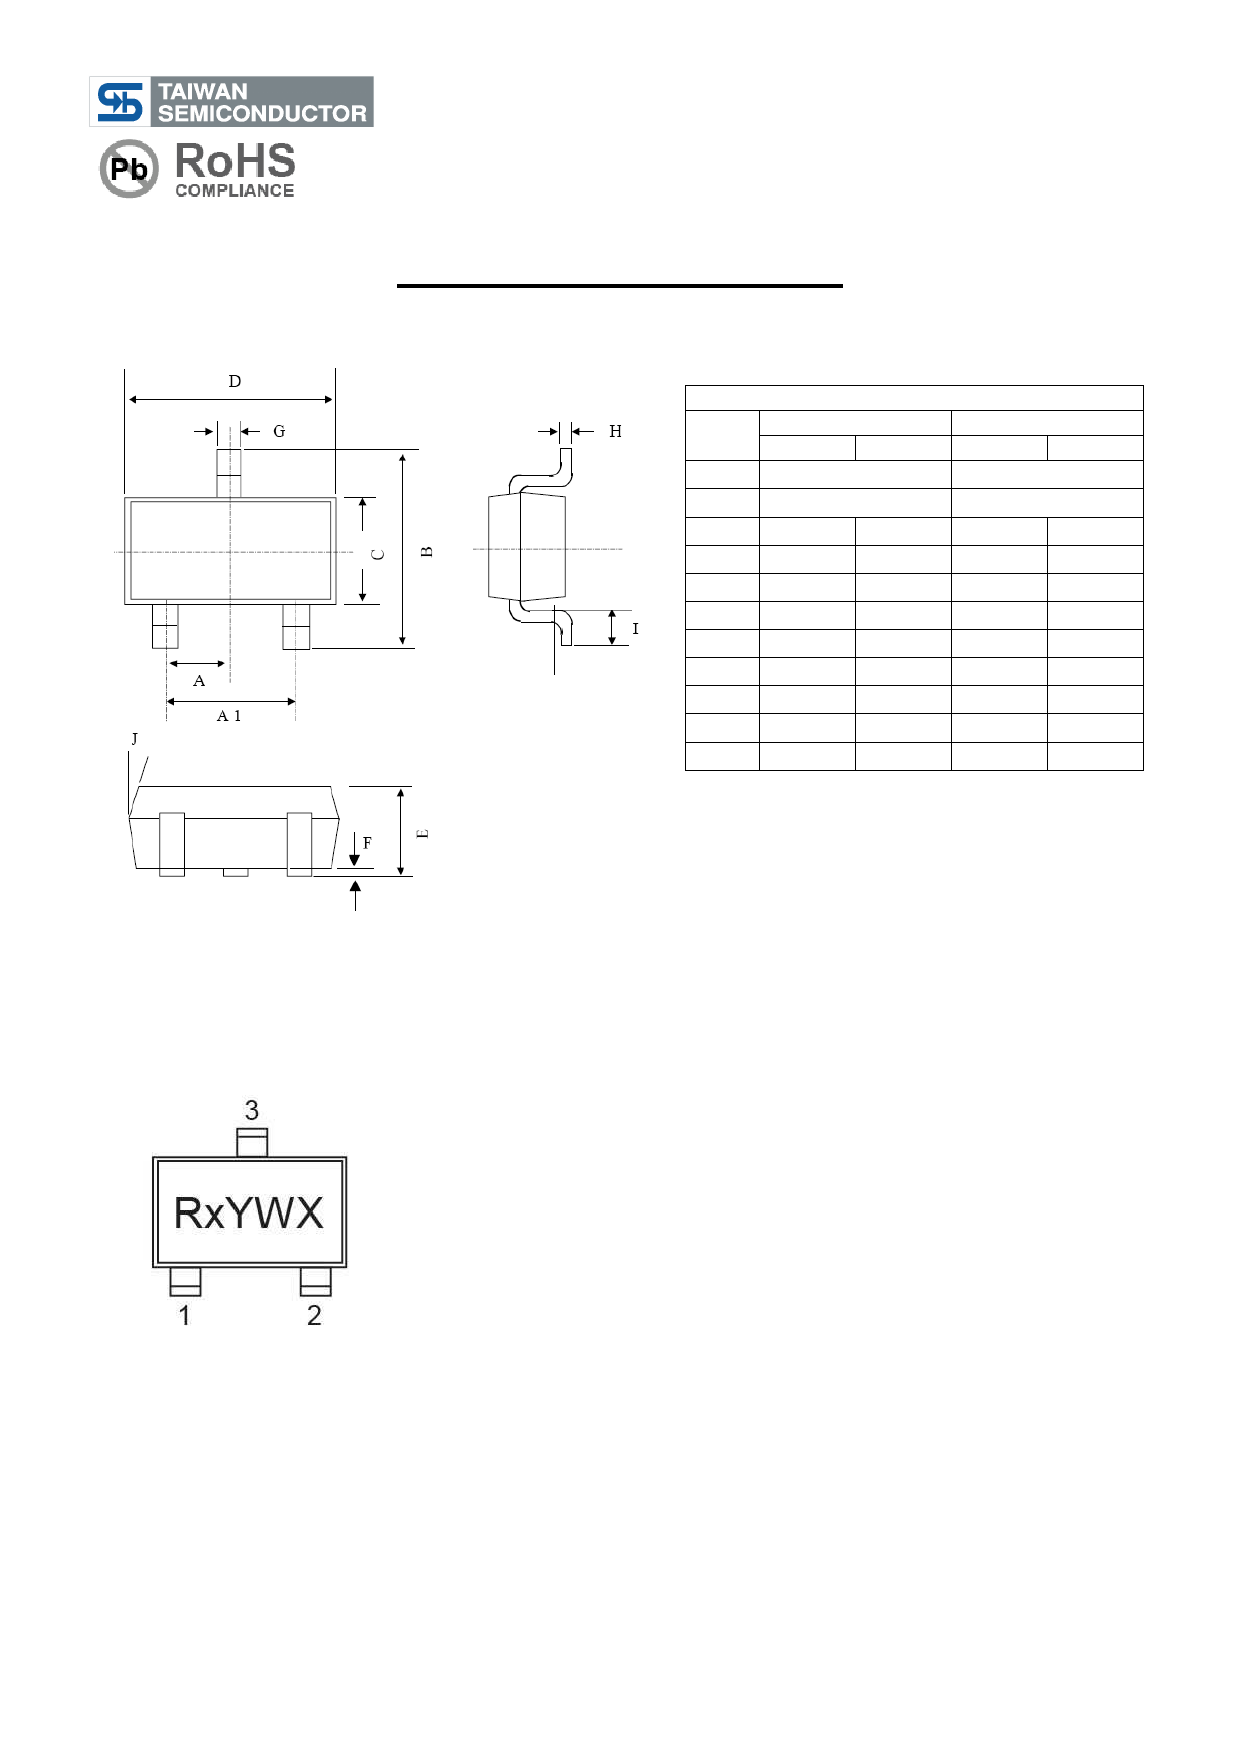 TS431-Z diode, scr